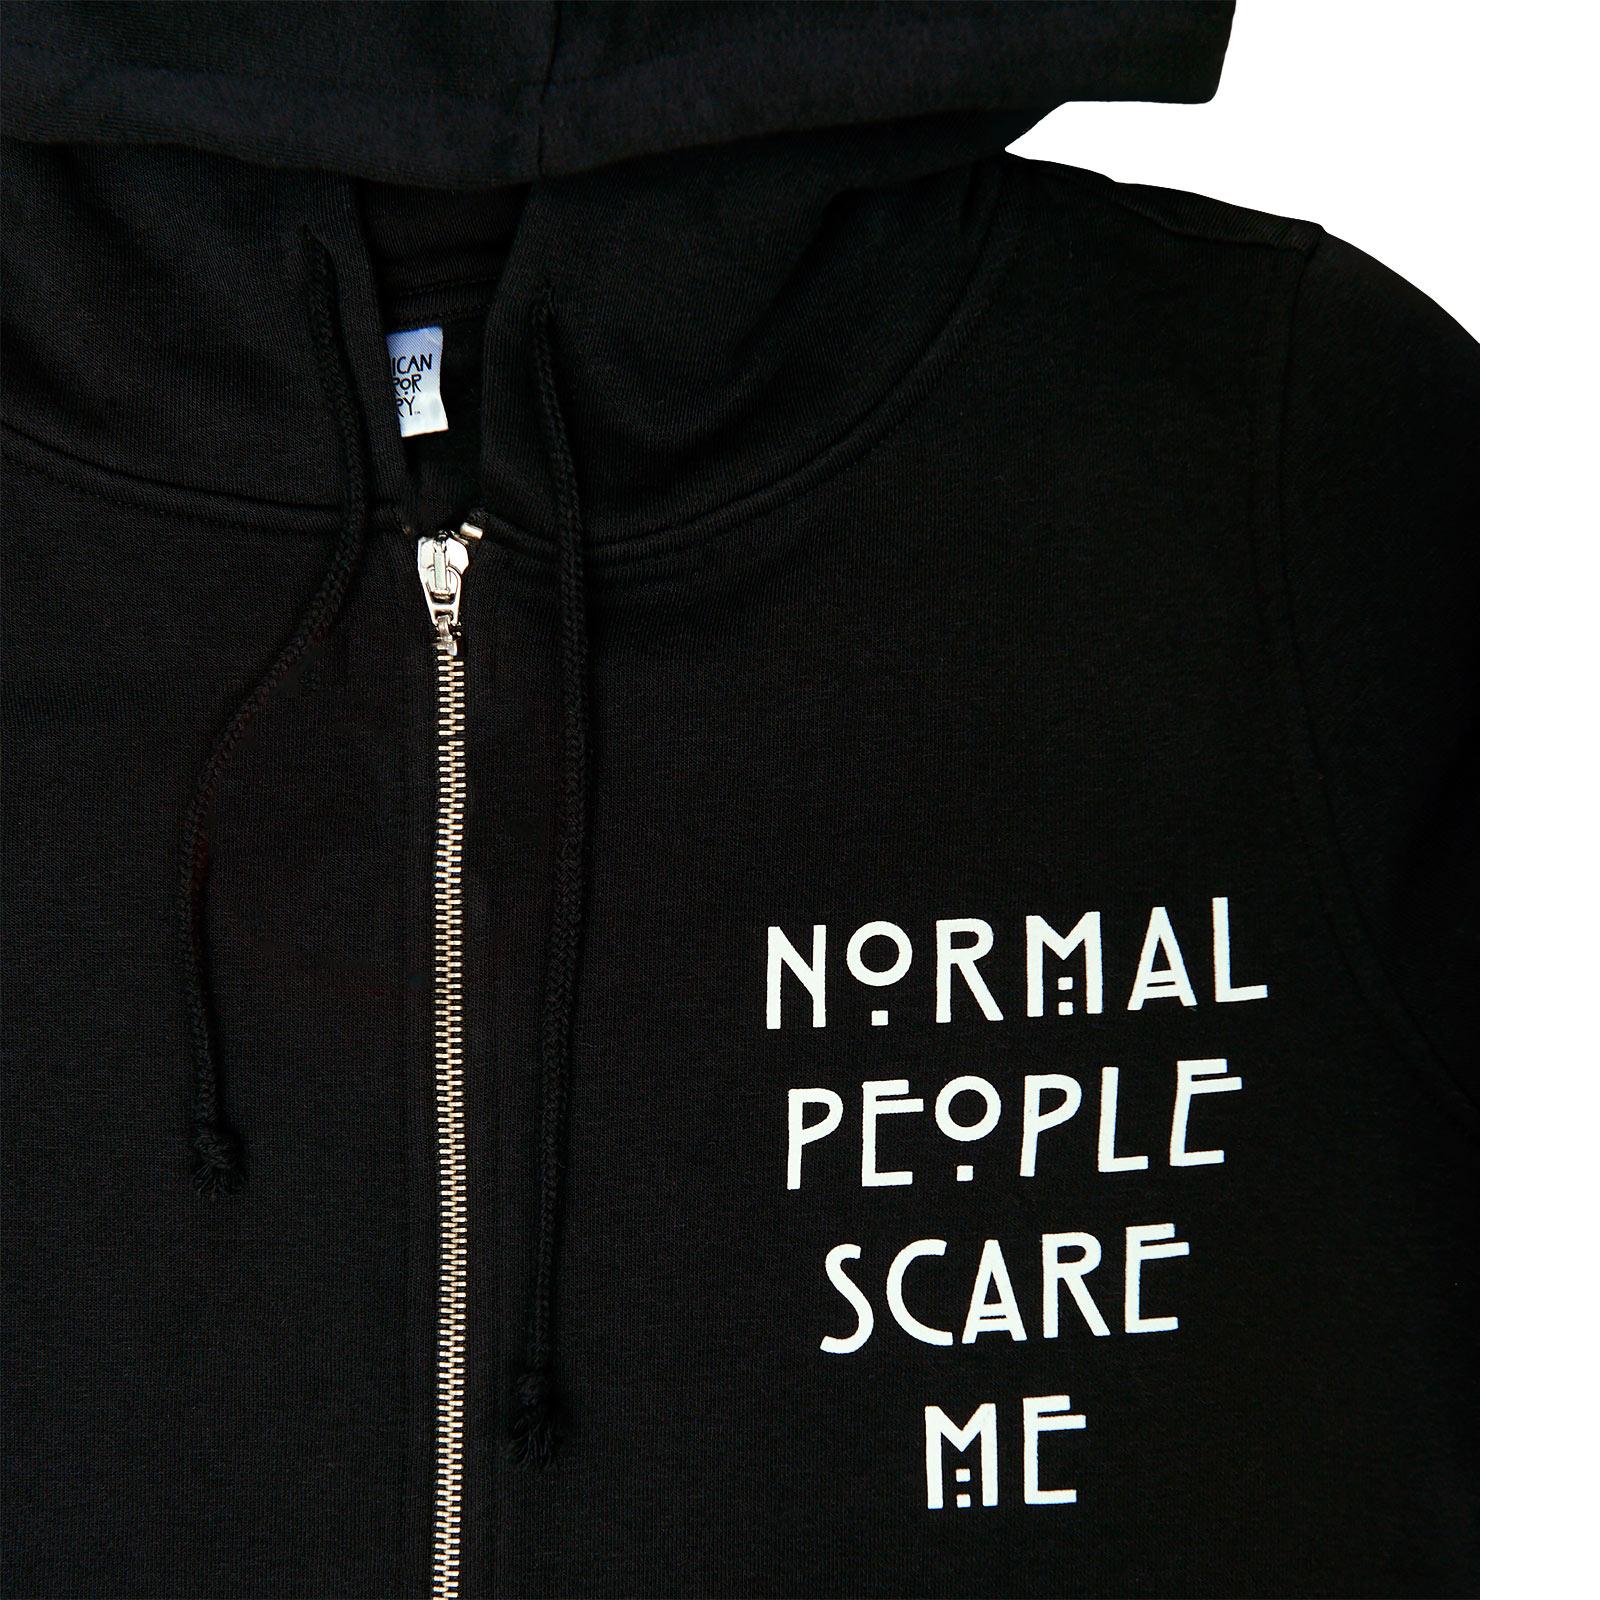 American Horror Story - Normal People Scare Me Kapuzenjacke Damen